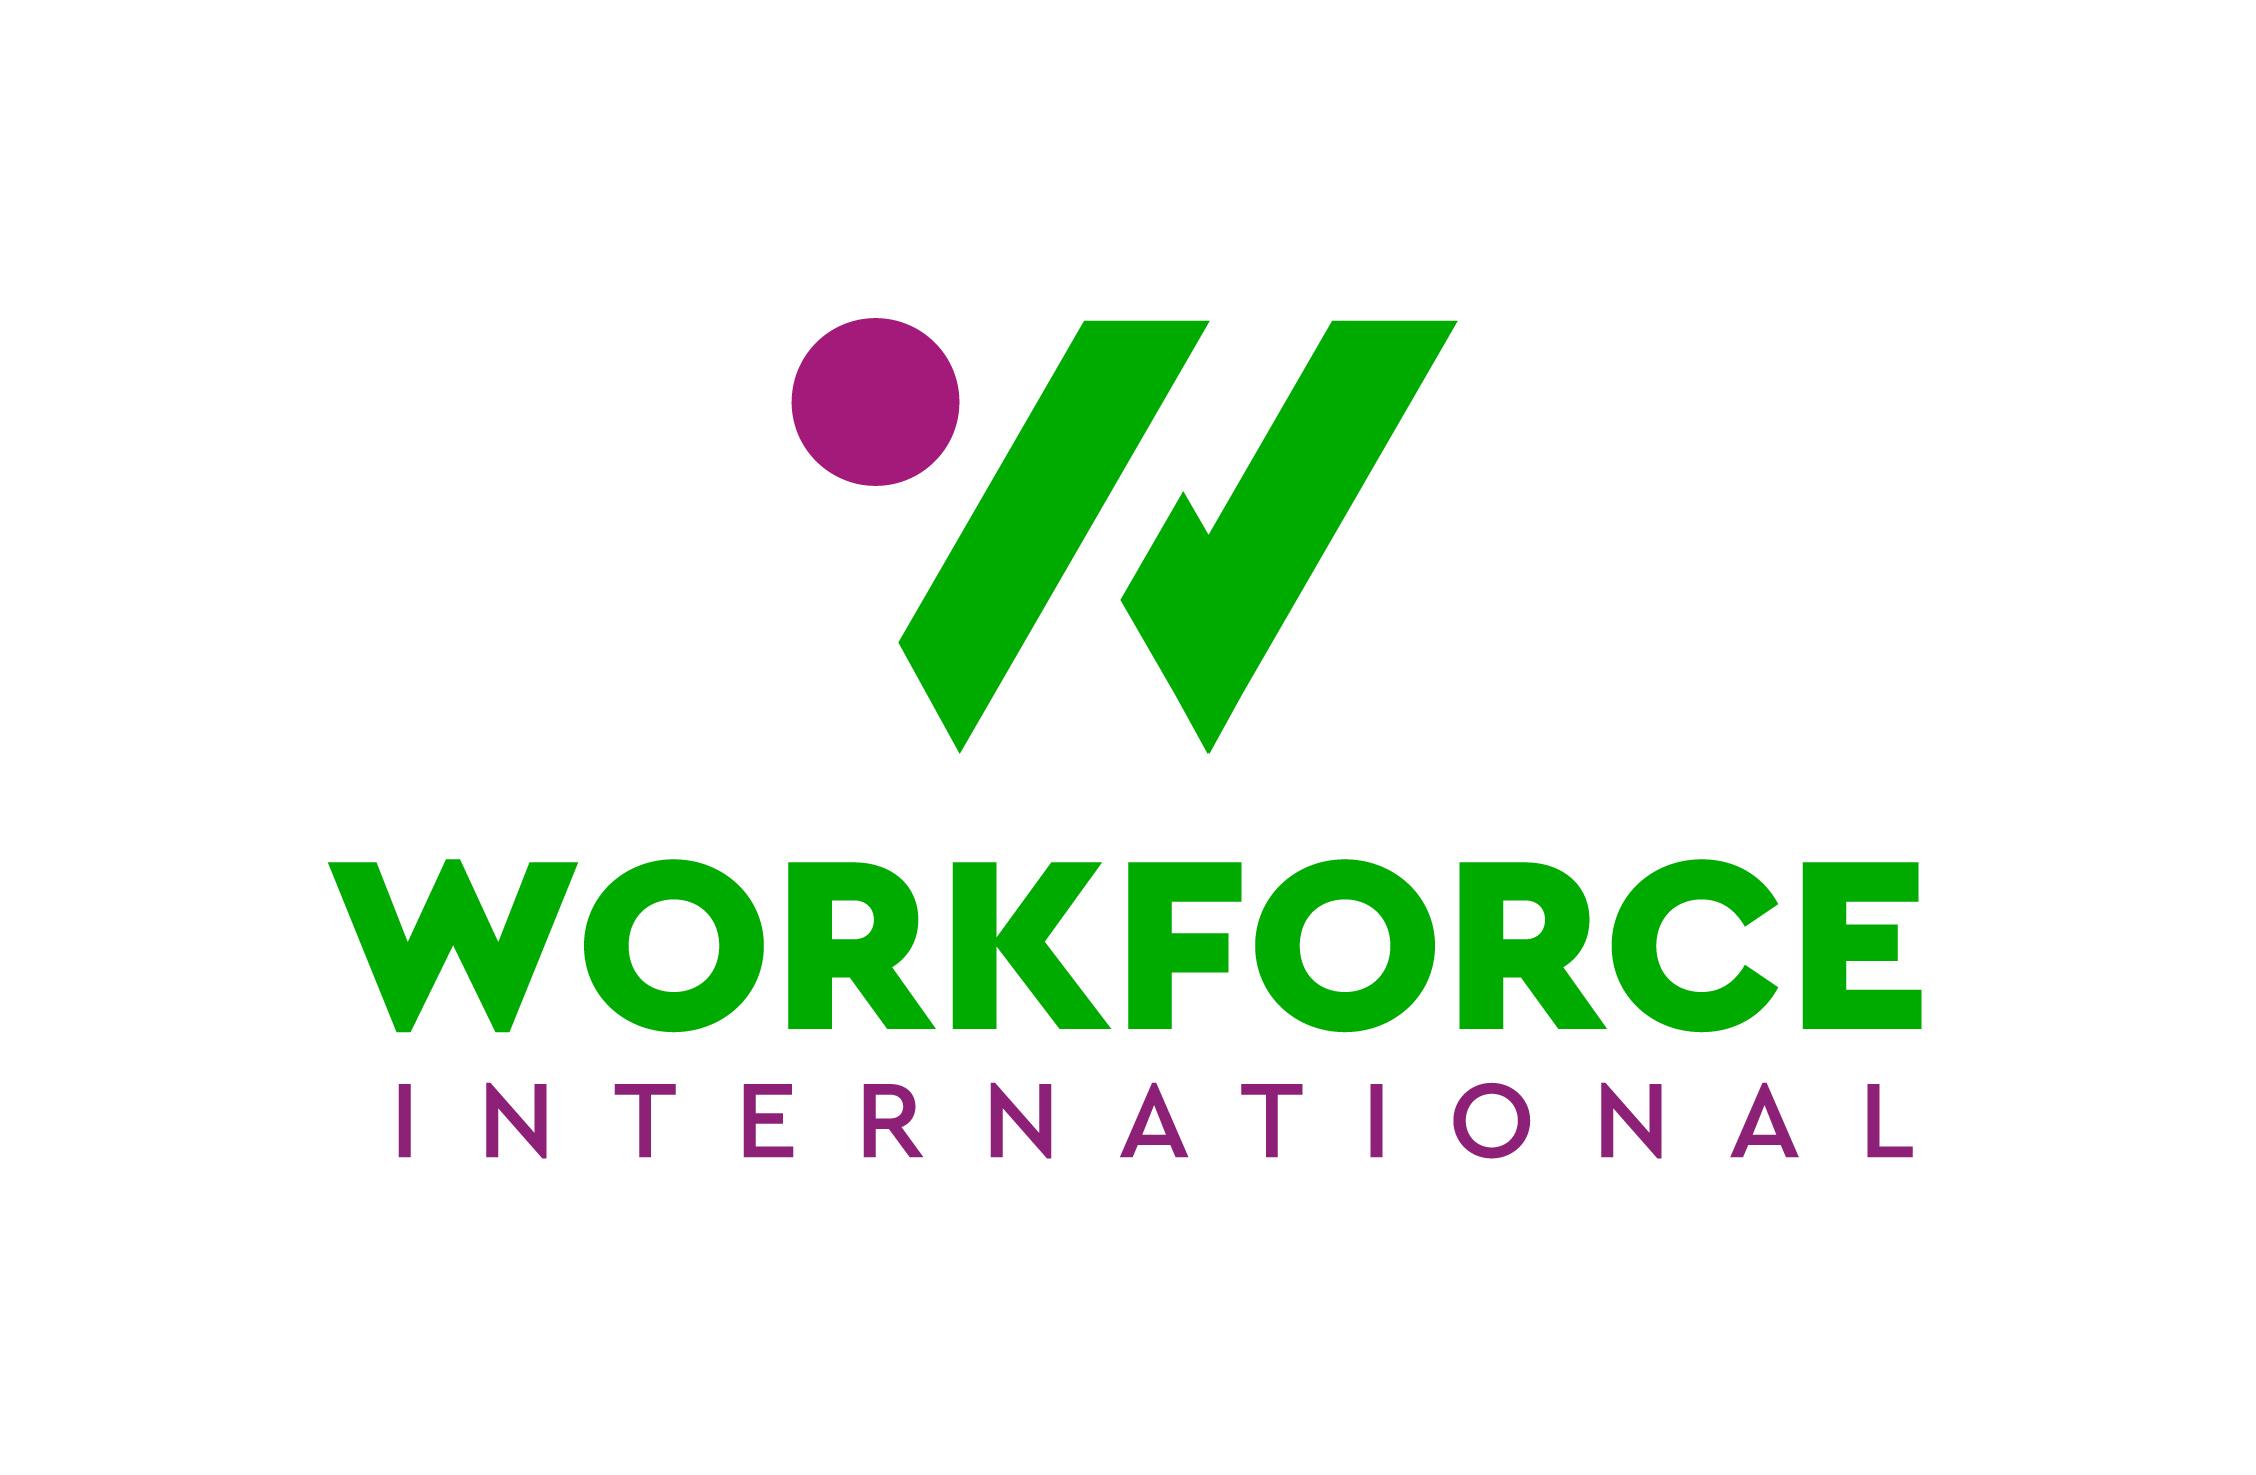 IWR WorkForce International